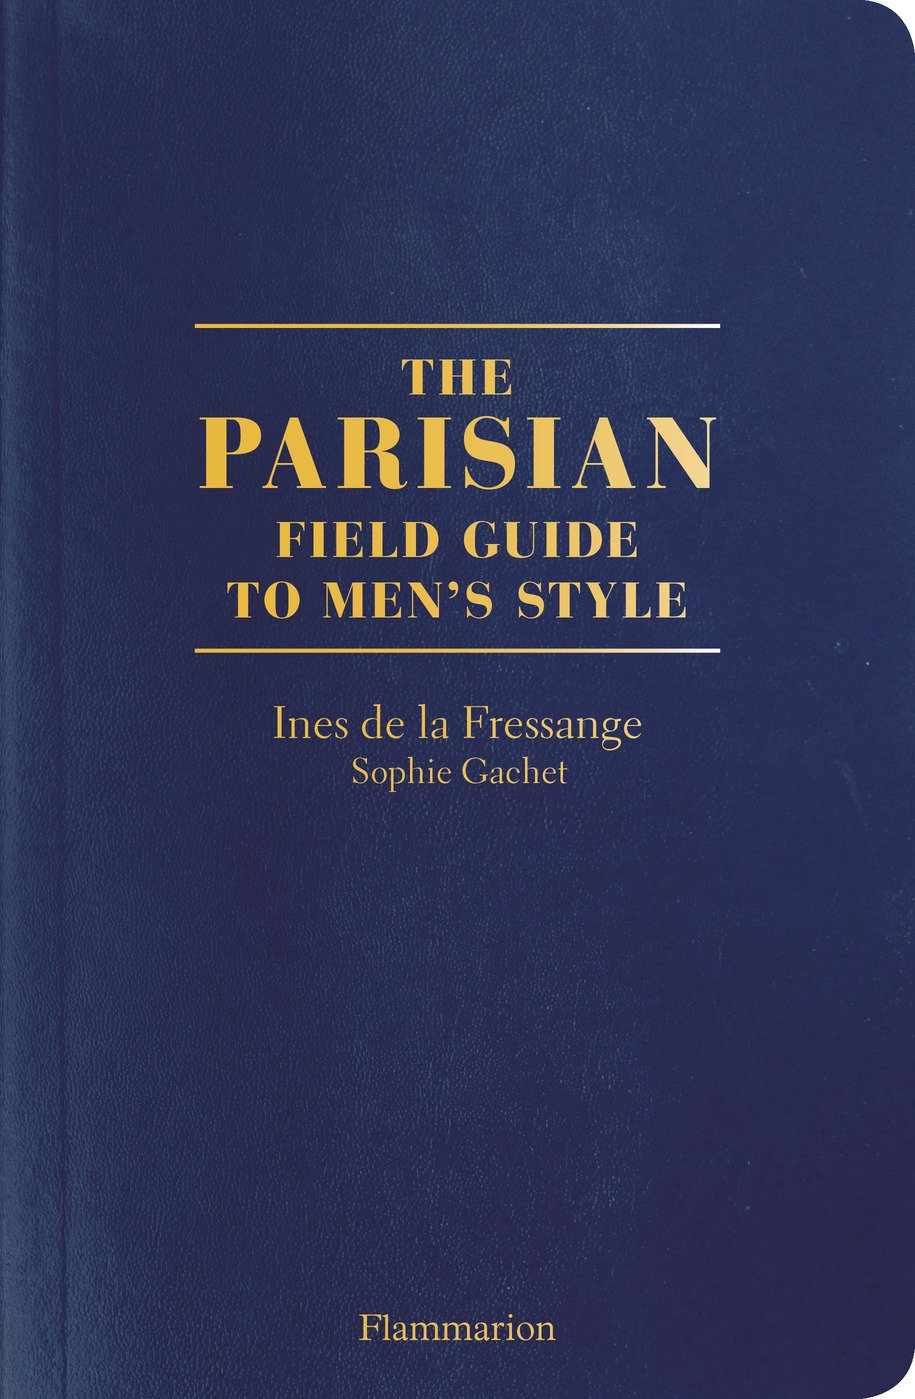 The Parisian Field Guide to Men's Style,By Ines de la Fressange